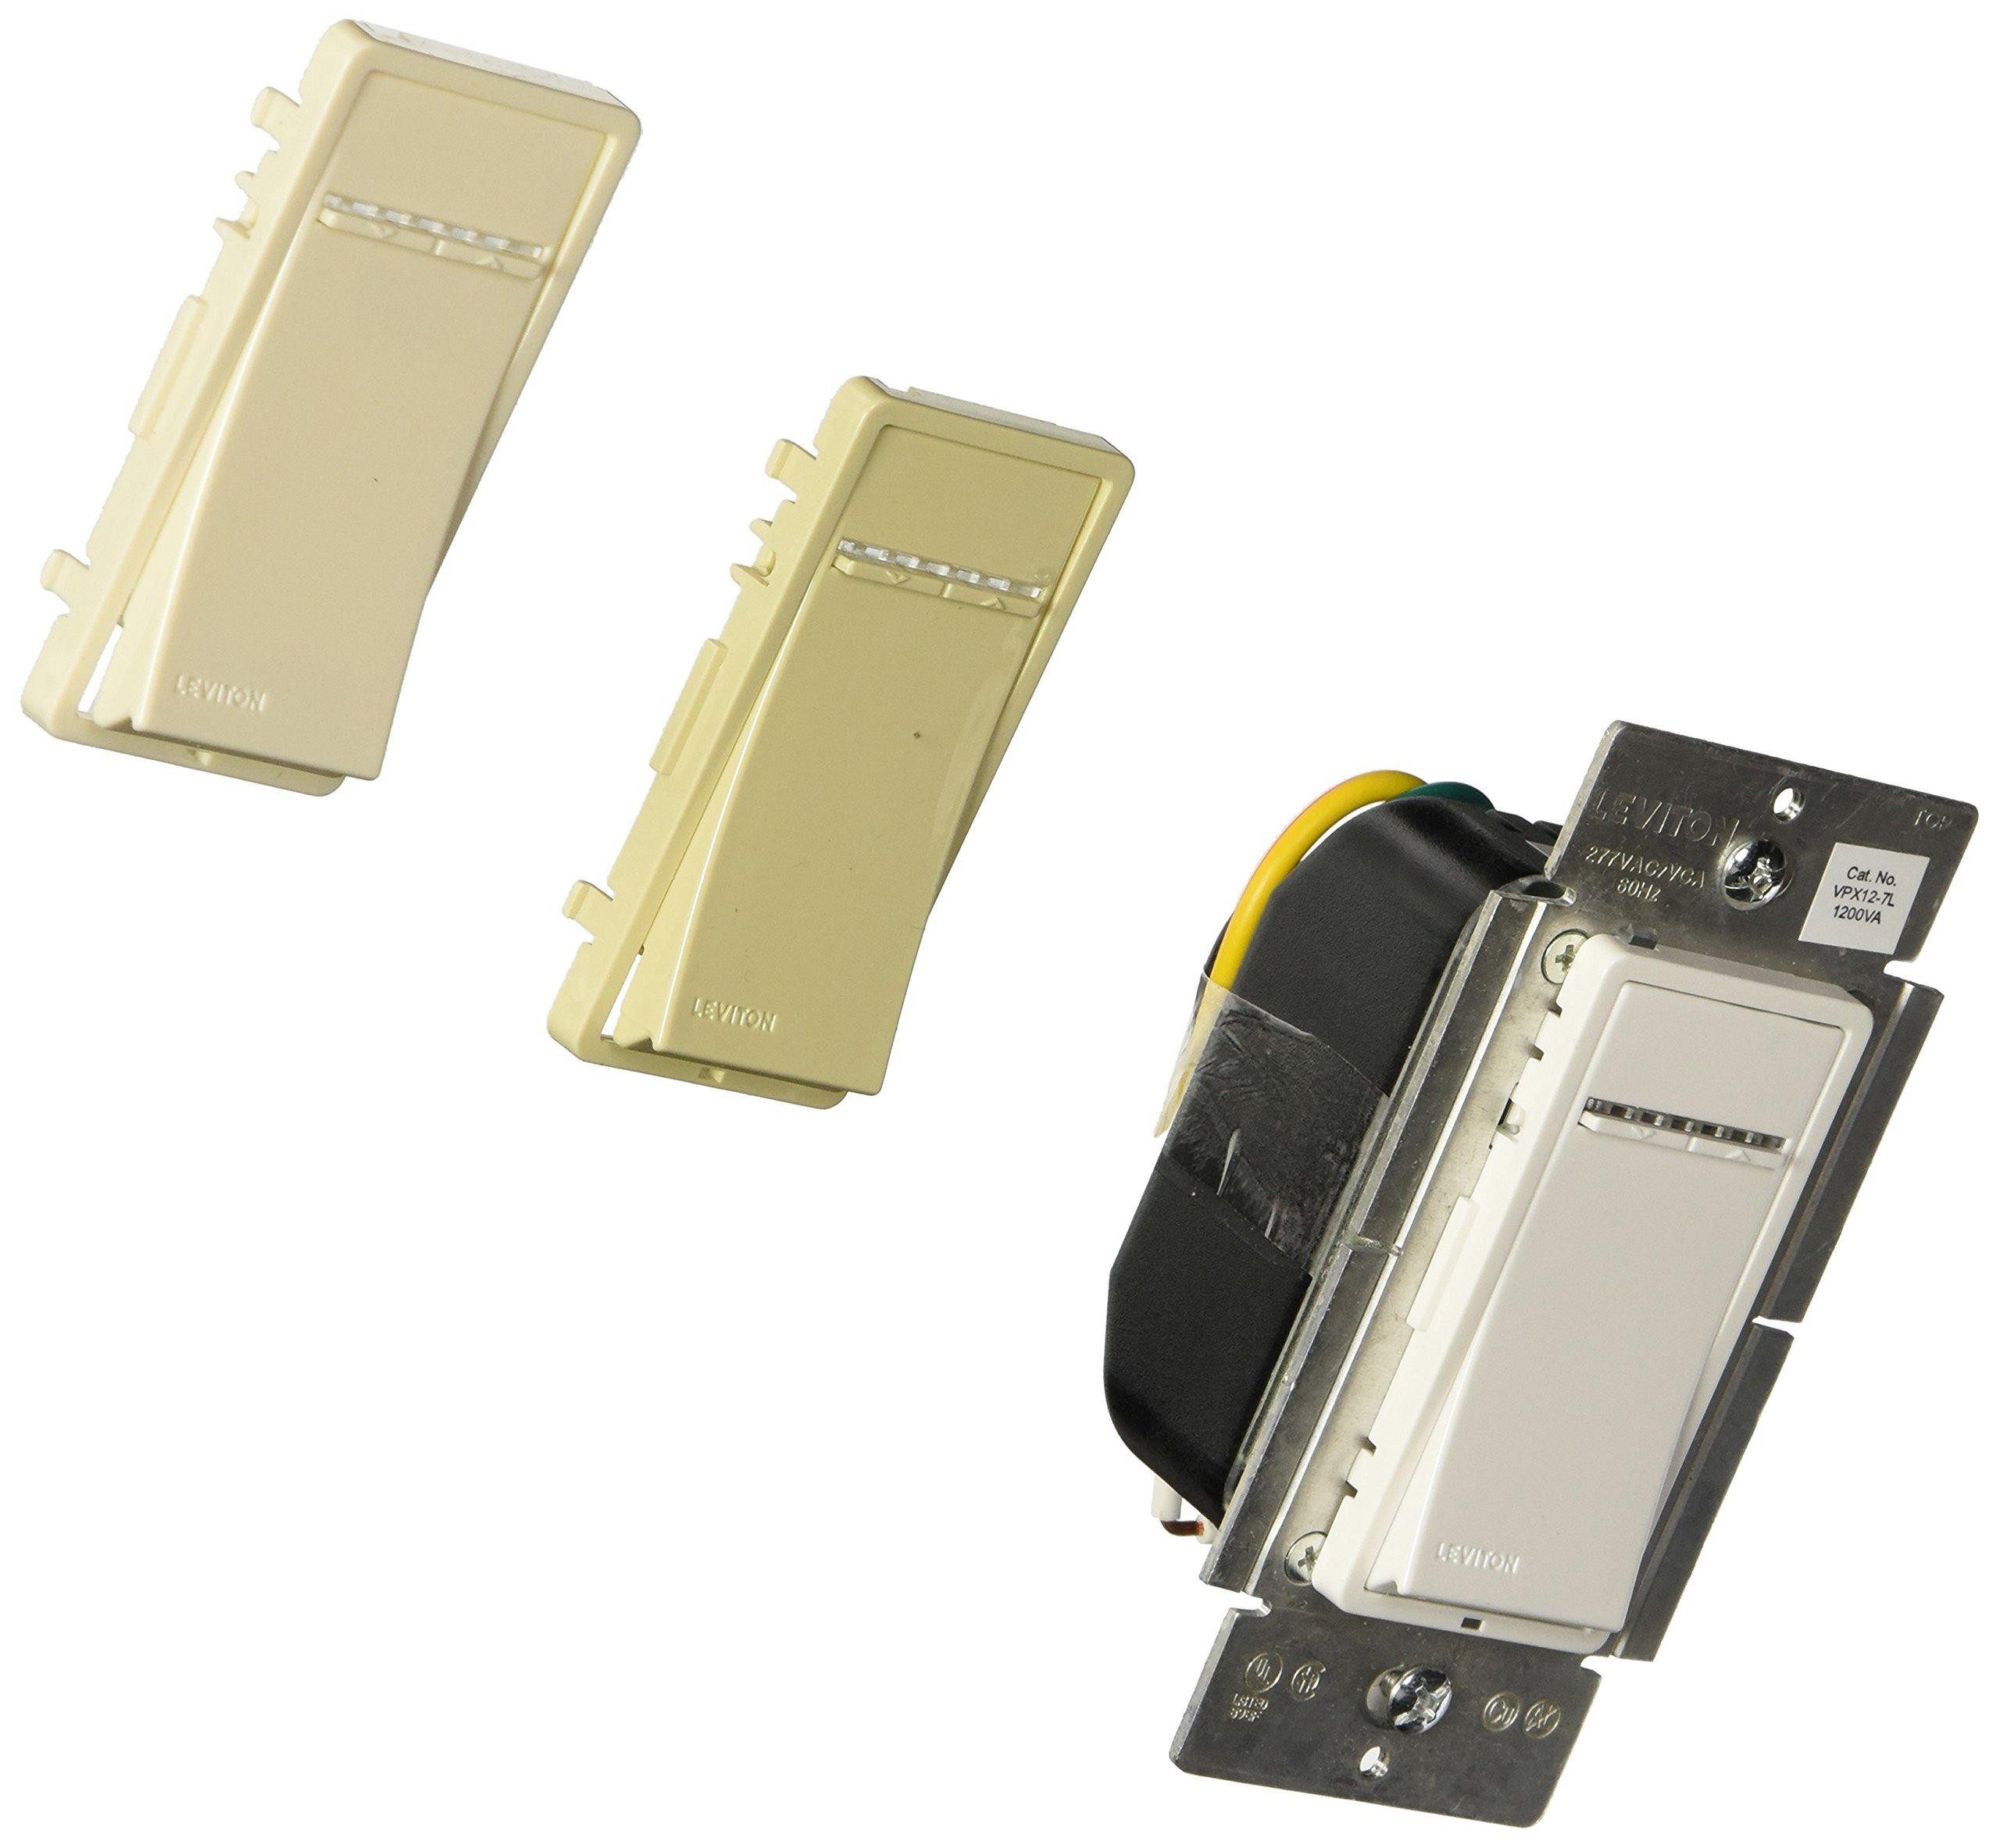 Leviton VPX12-7LZ, Vizia + Digital 1200VA Fluorescent Dimmer for Mark 10 Powerline Ballasts, Single Pole and 3-Way, White/Ivory/Light Almond